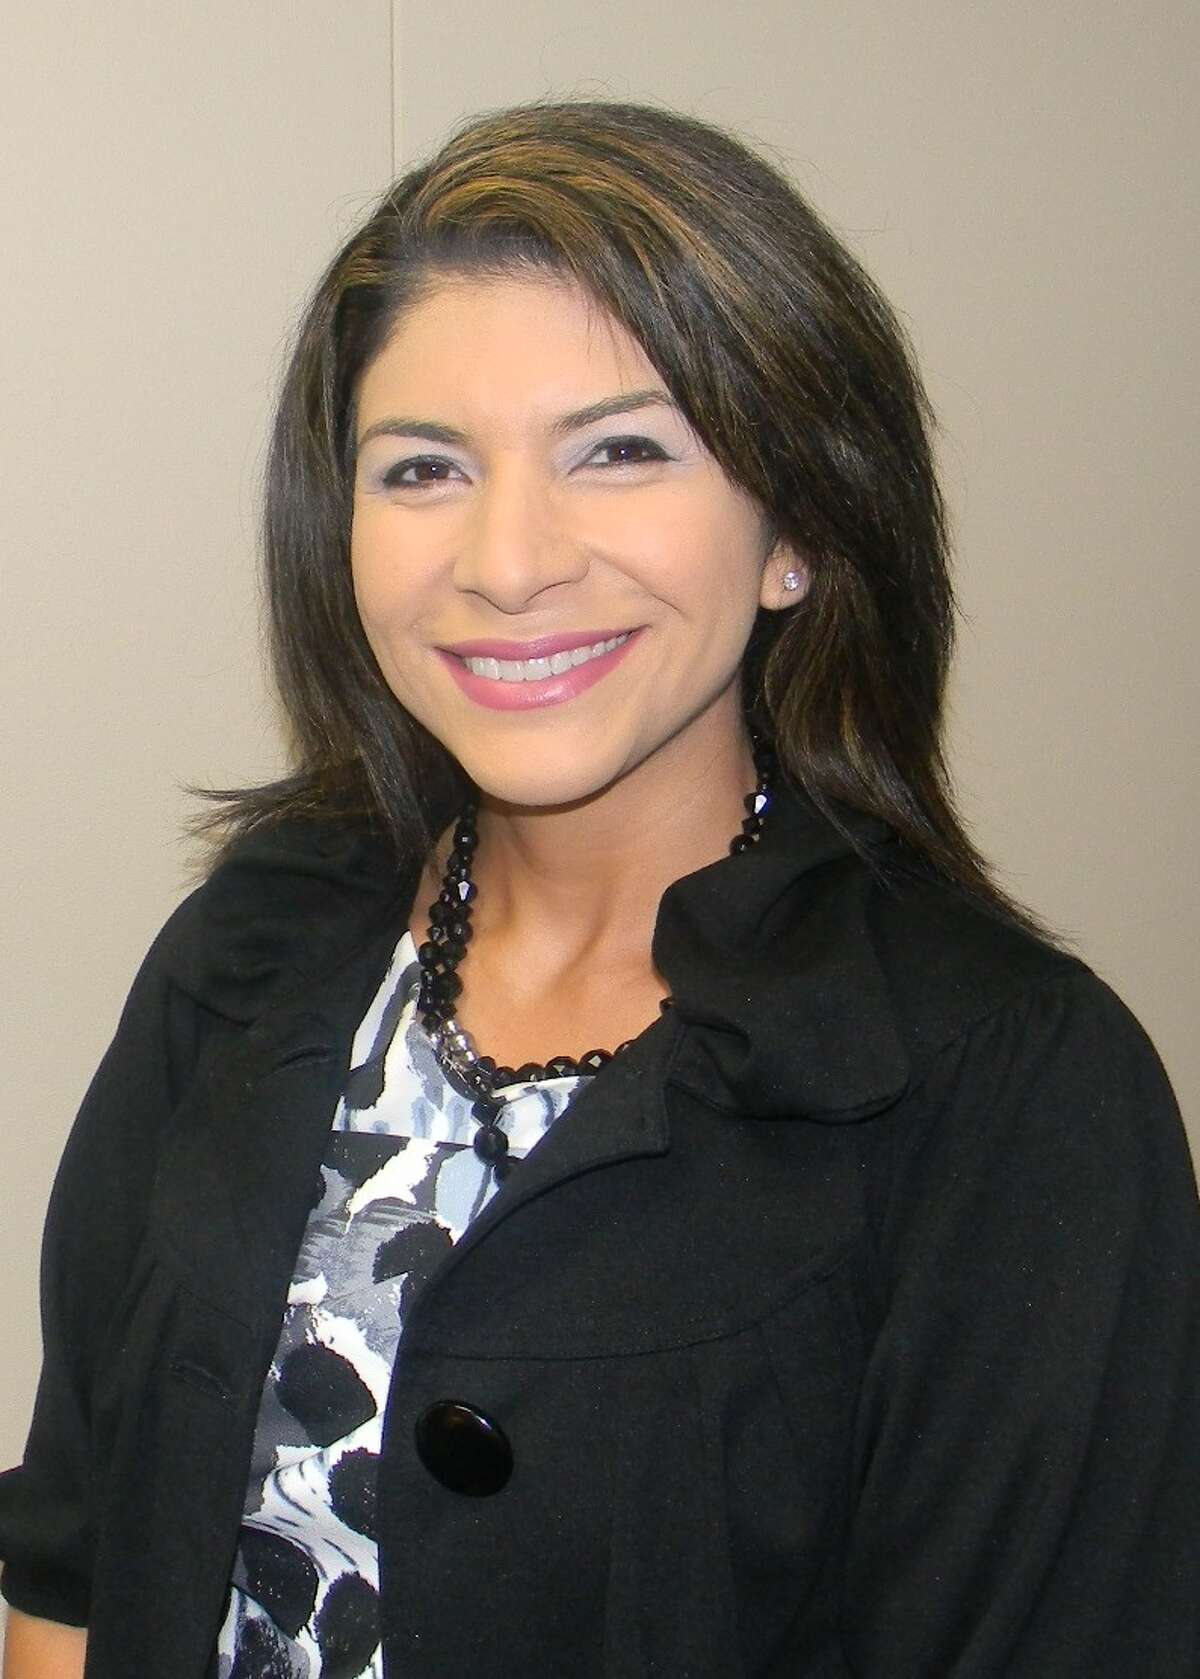 Laura Ramirez, third vice president of membership at Texas Elementary Principals and Supervisors Association